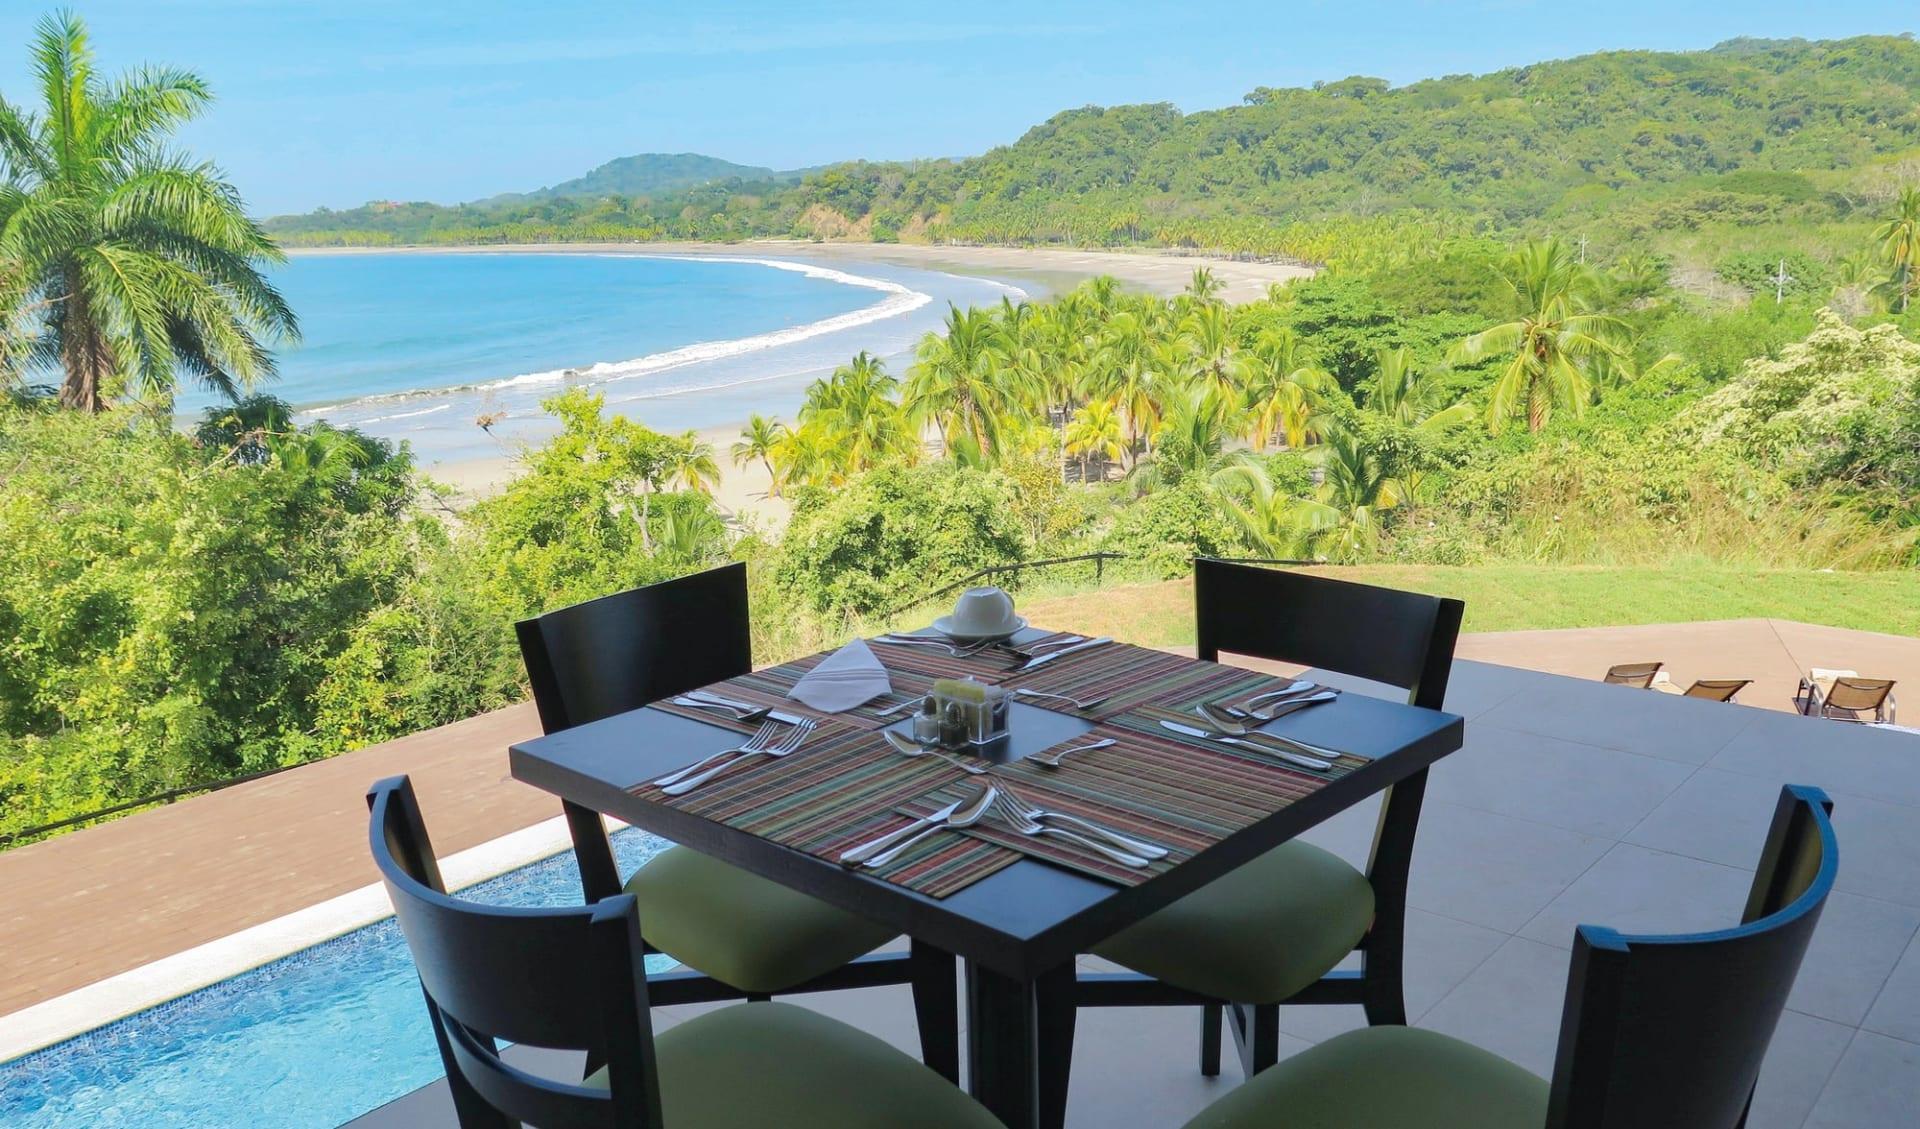 Nammbú Beachfront Bungalows in Playa Carillo:  Nammbu Hotel Costa Rica - Terrasse mit Meerblick c Latinconnect